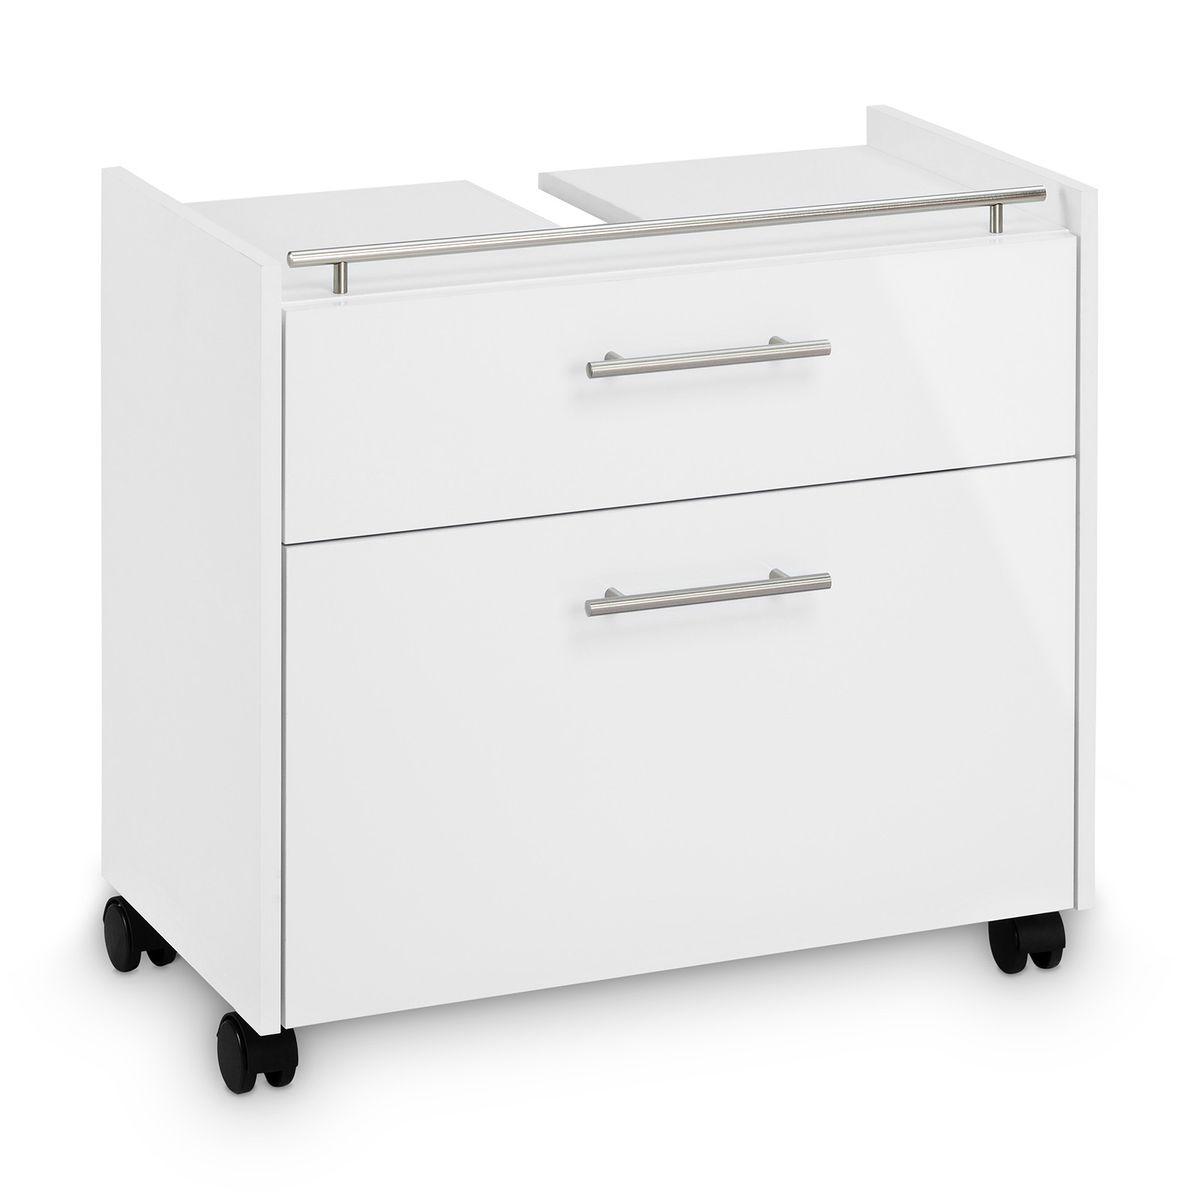 Badmöbel-Set FROSTI 2-teilig Weiß – Bild 5